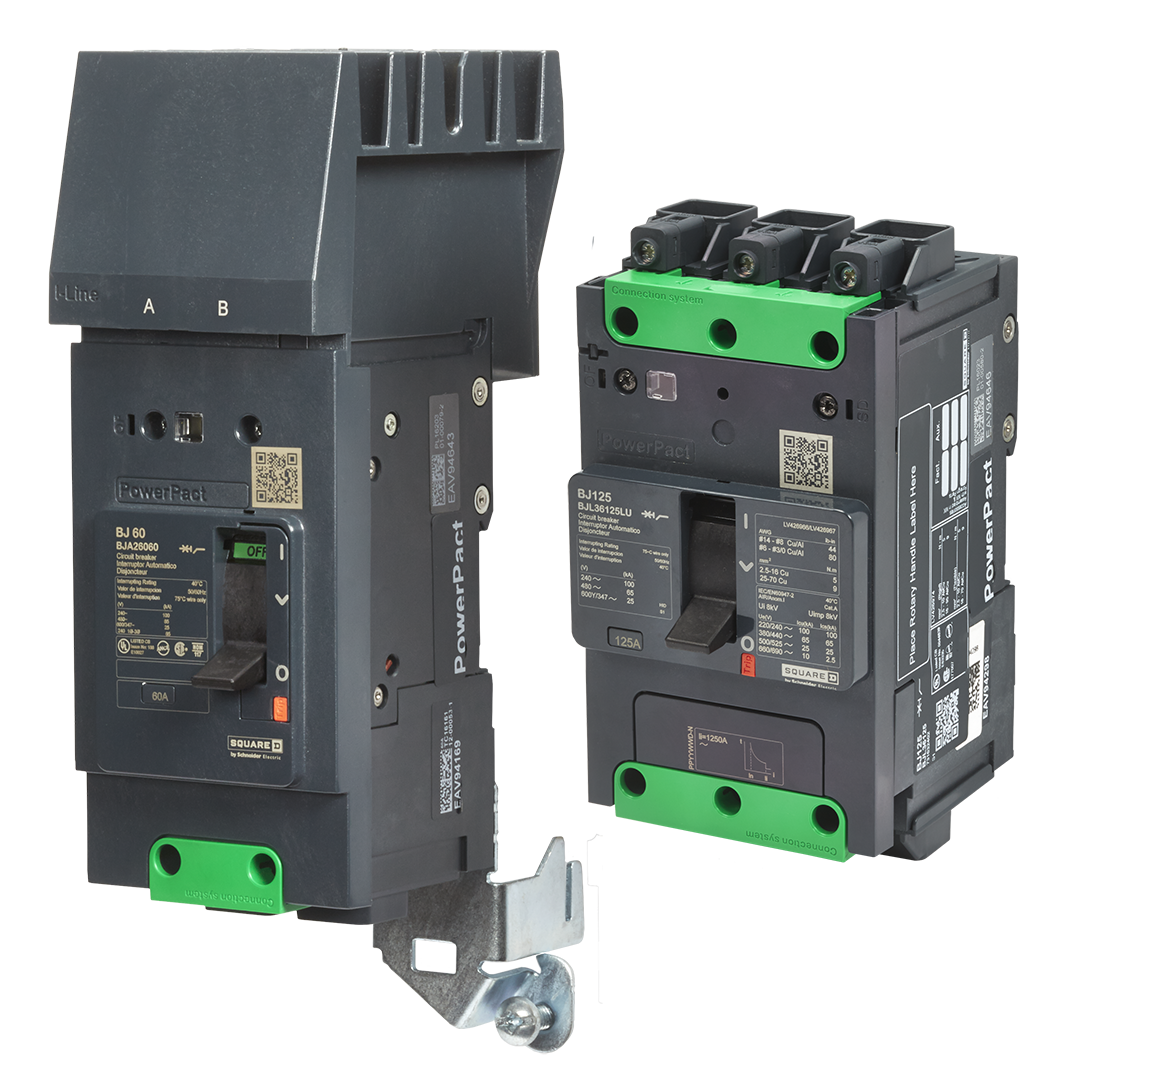 PowerPact B Circuit Breakers